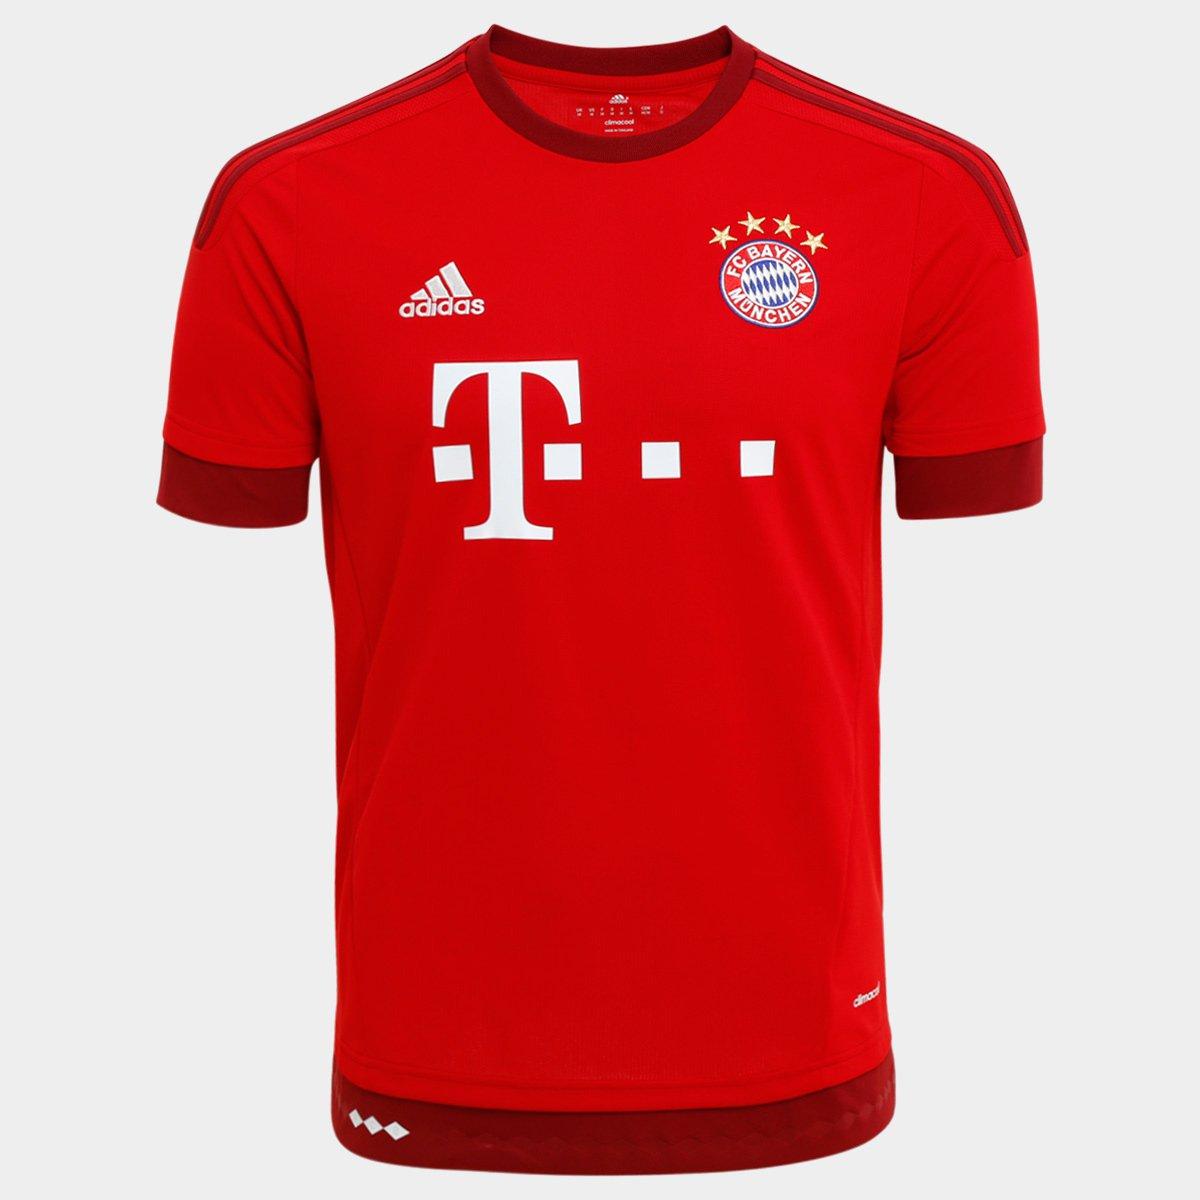 Camisa Bayern de Munique Home 15 16 s nº Torcedor Adidas Masculina - Compre  Agora  71a6e3089fa1a